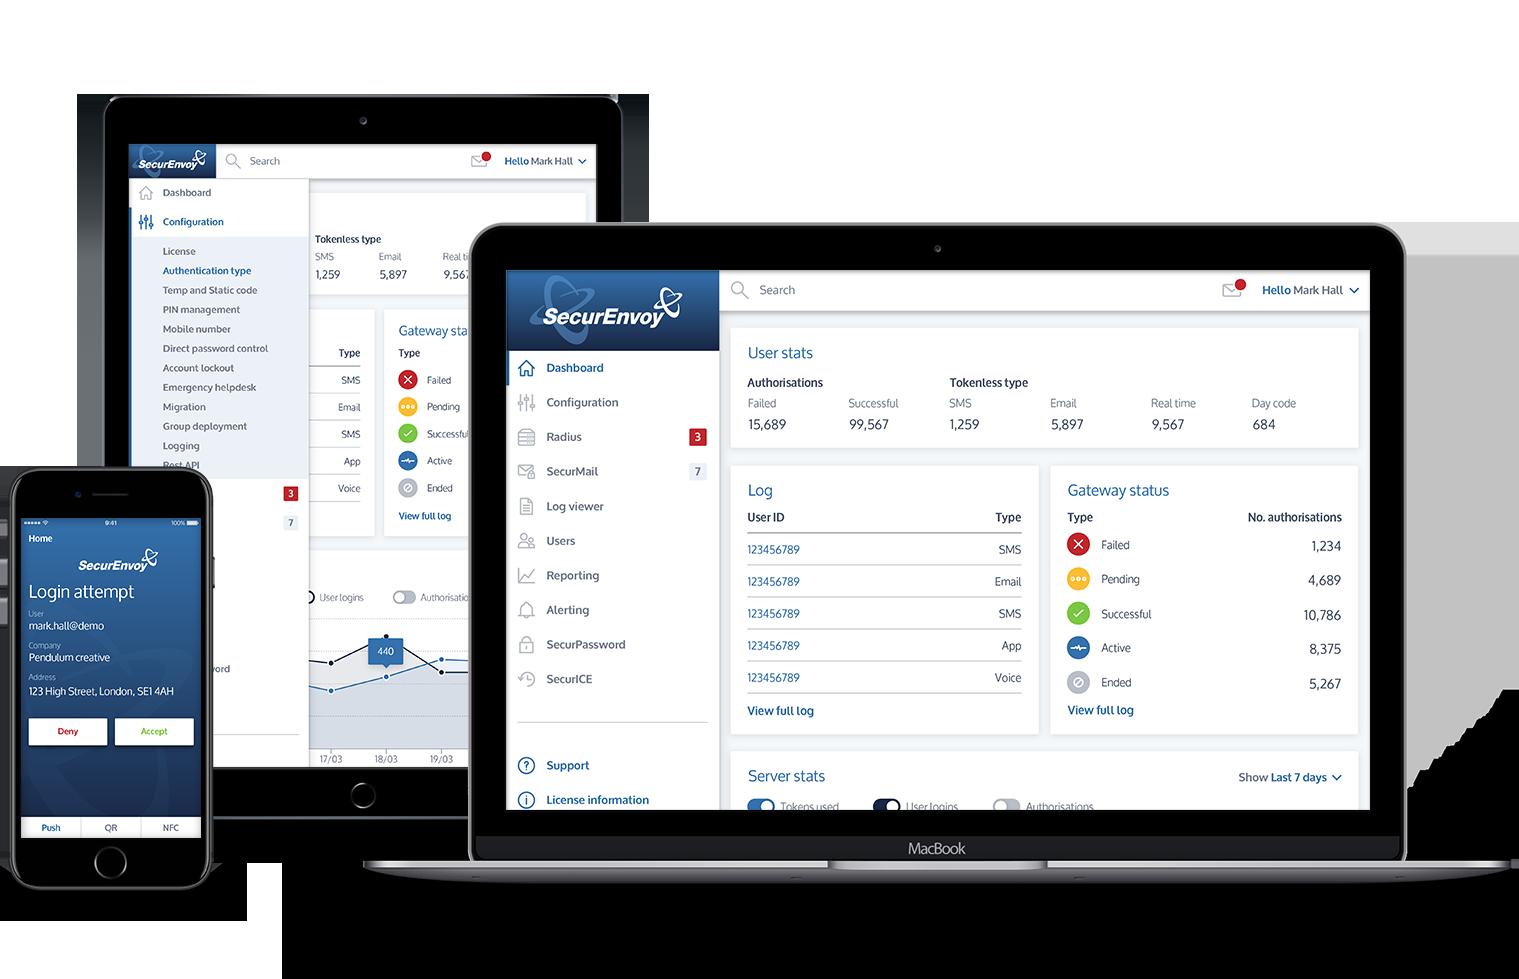 SecurEnvoy multiple device layout